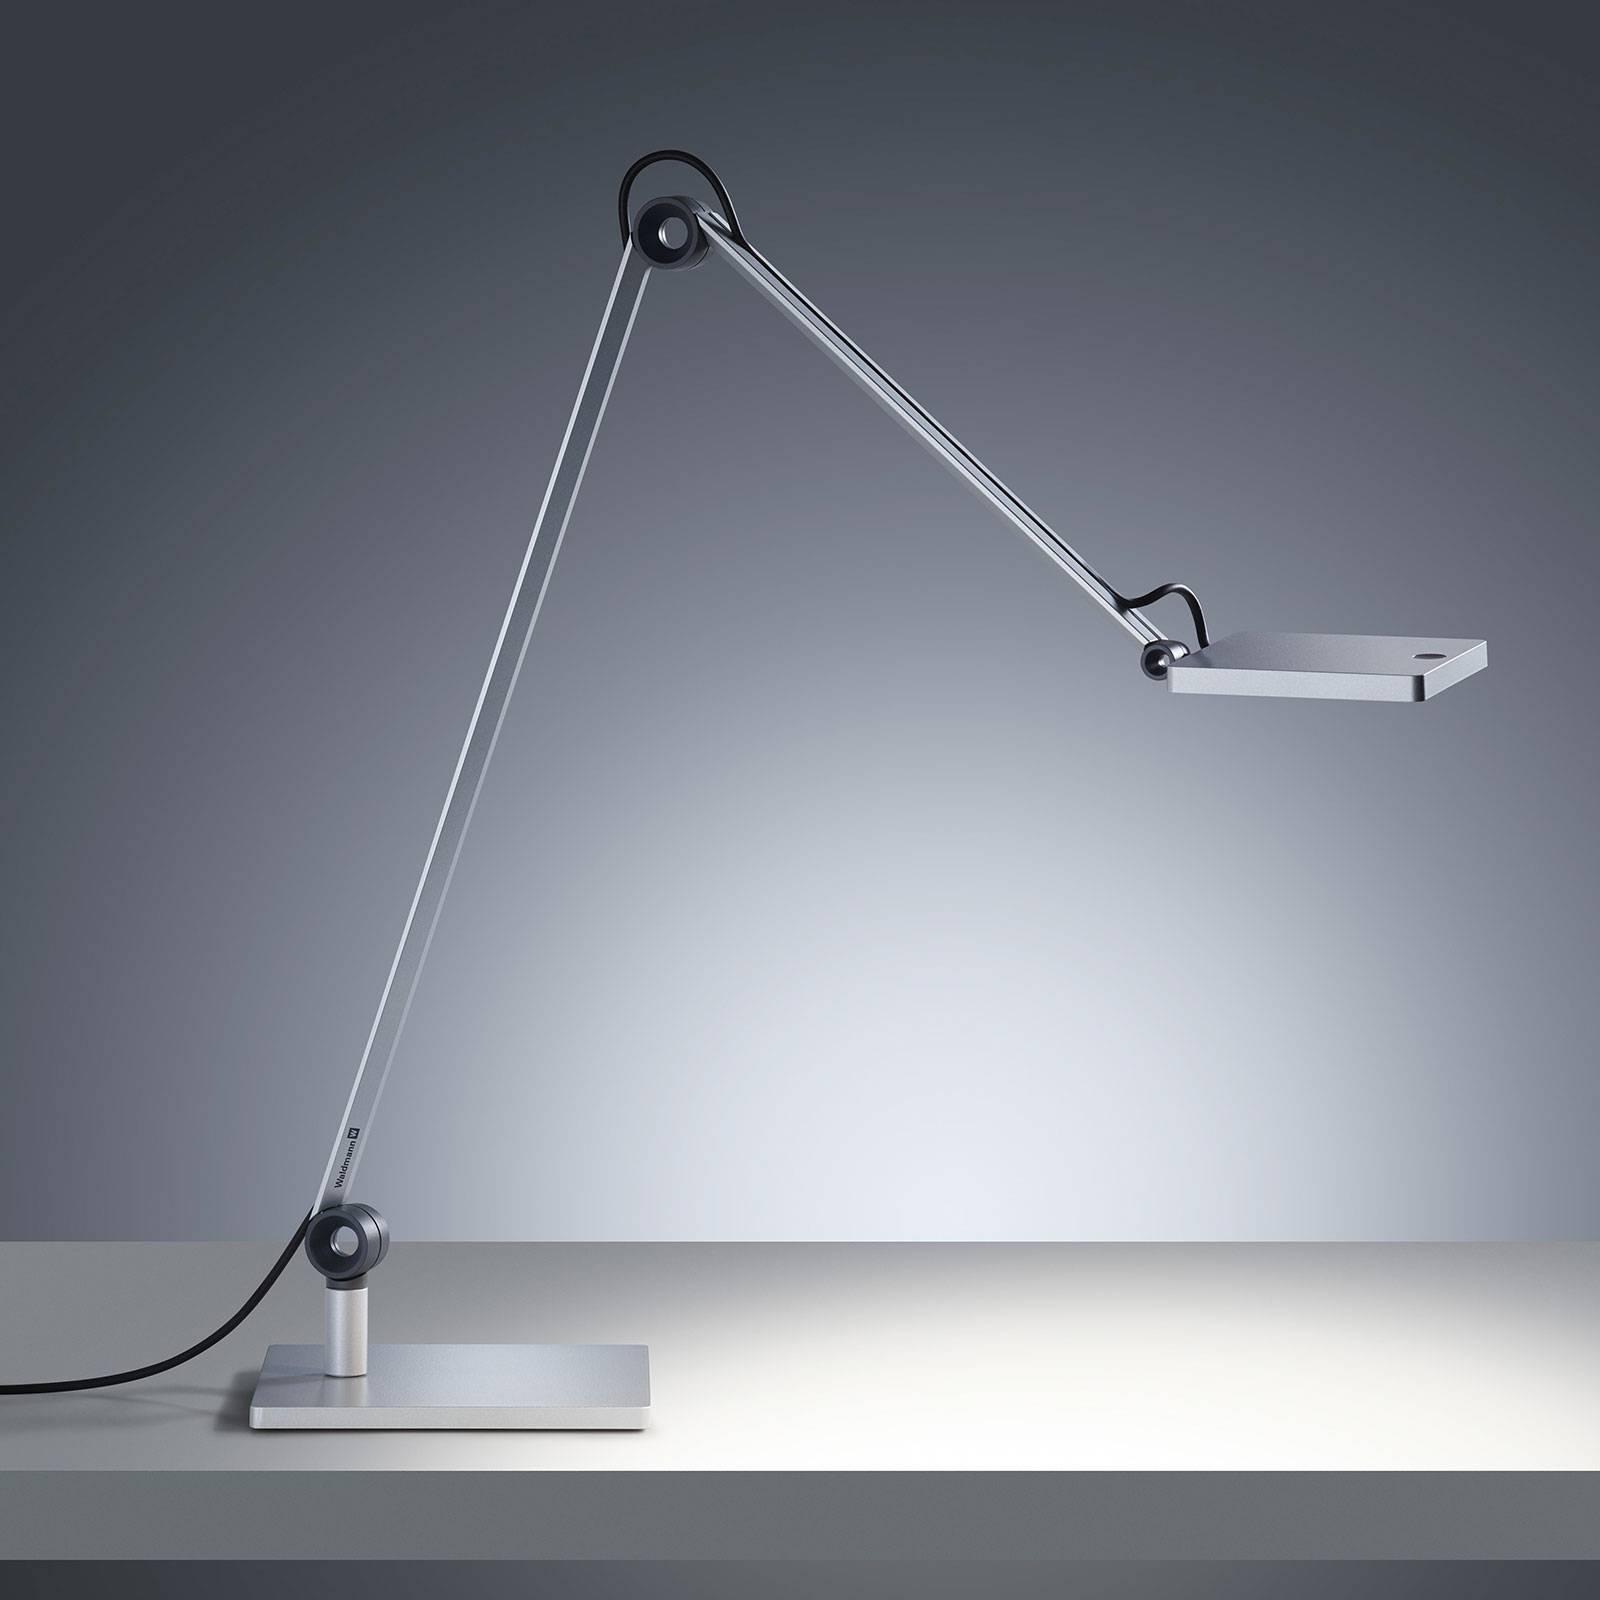 LED-pöytälamppu PARA.MI FTL 108 R hopea 940